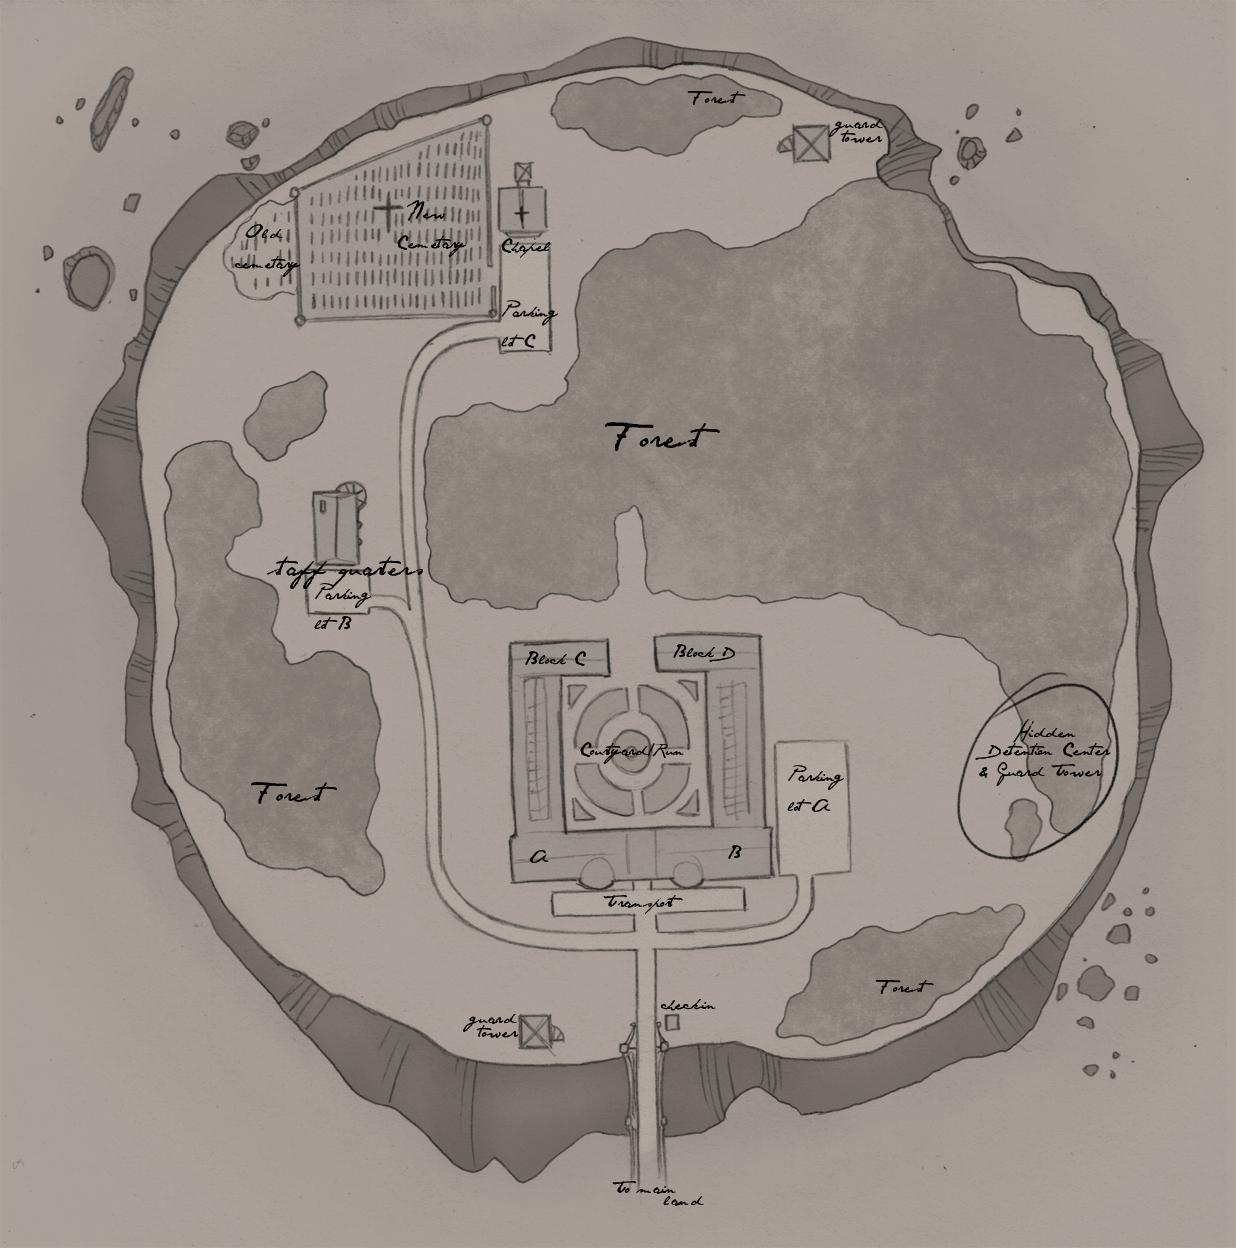 Winthrop Island – Rough Map